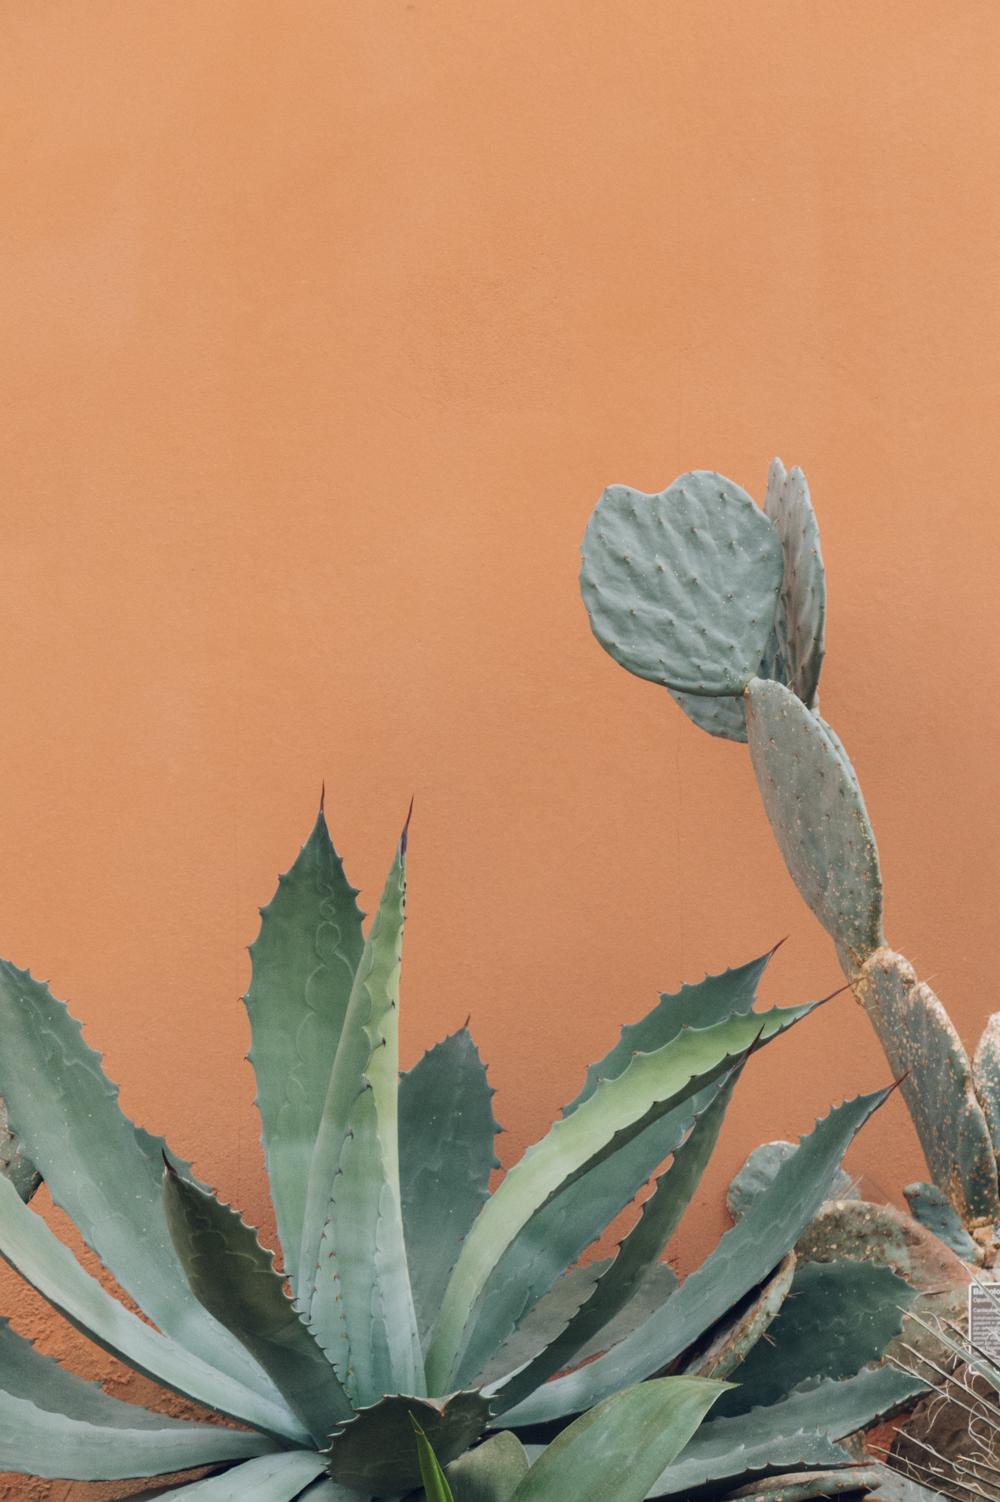 Haarkon Harken Harkon Botanical Garden Botanicus Cacti